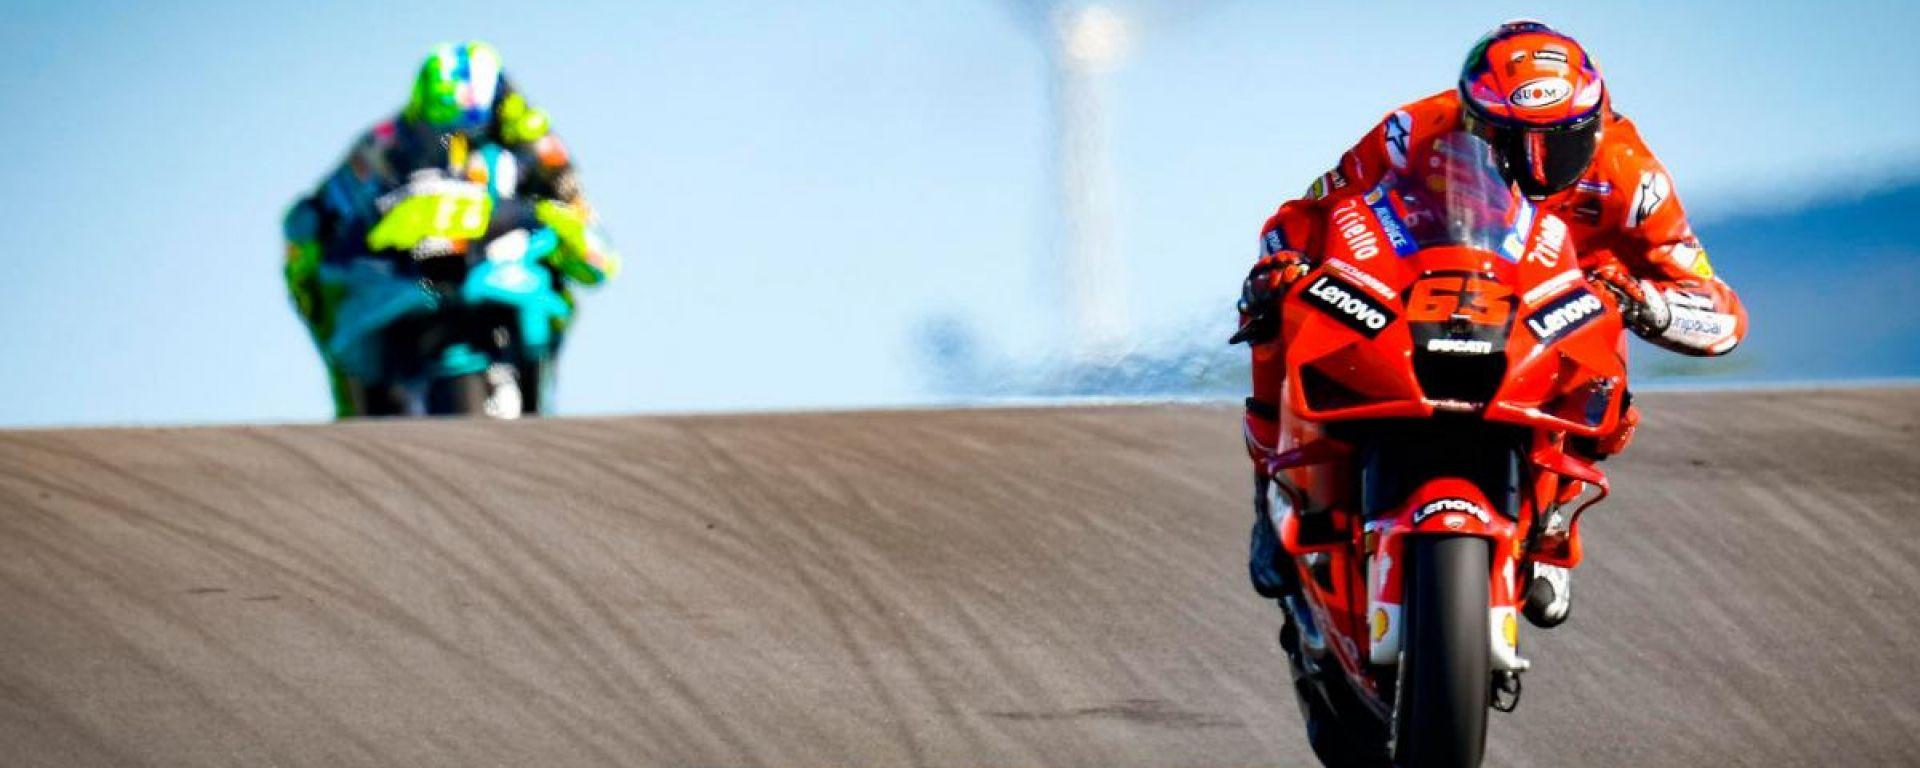 MotoGP Portogallo 2021, Portimao: Francesco Bagnaia (Ducati) e Valentino Rossi (Yamaha Petronas)